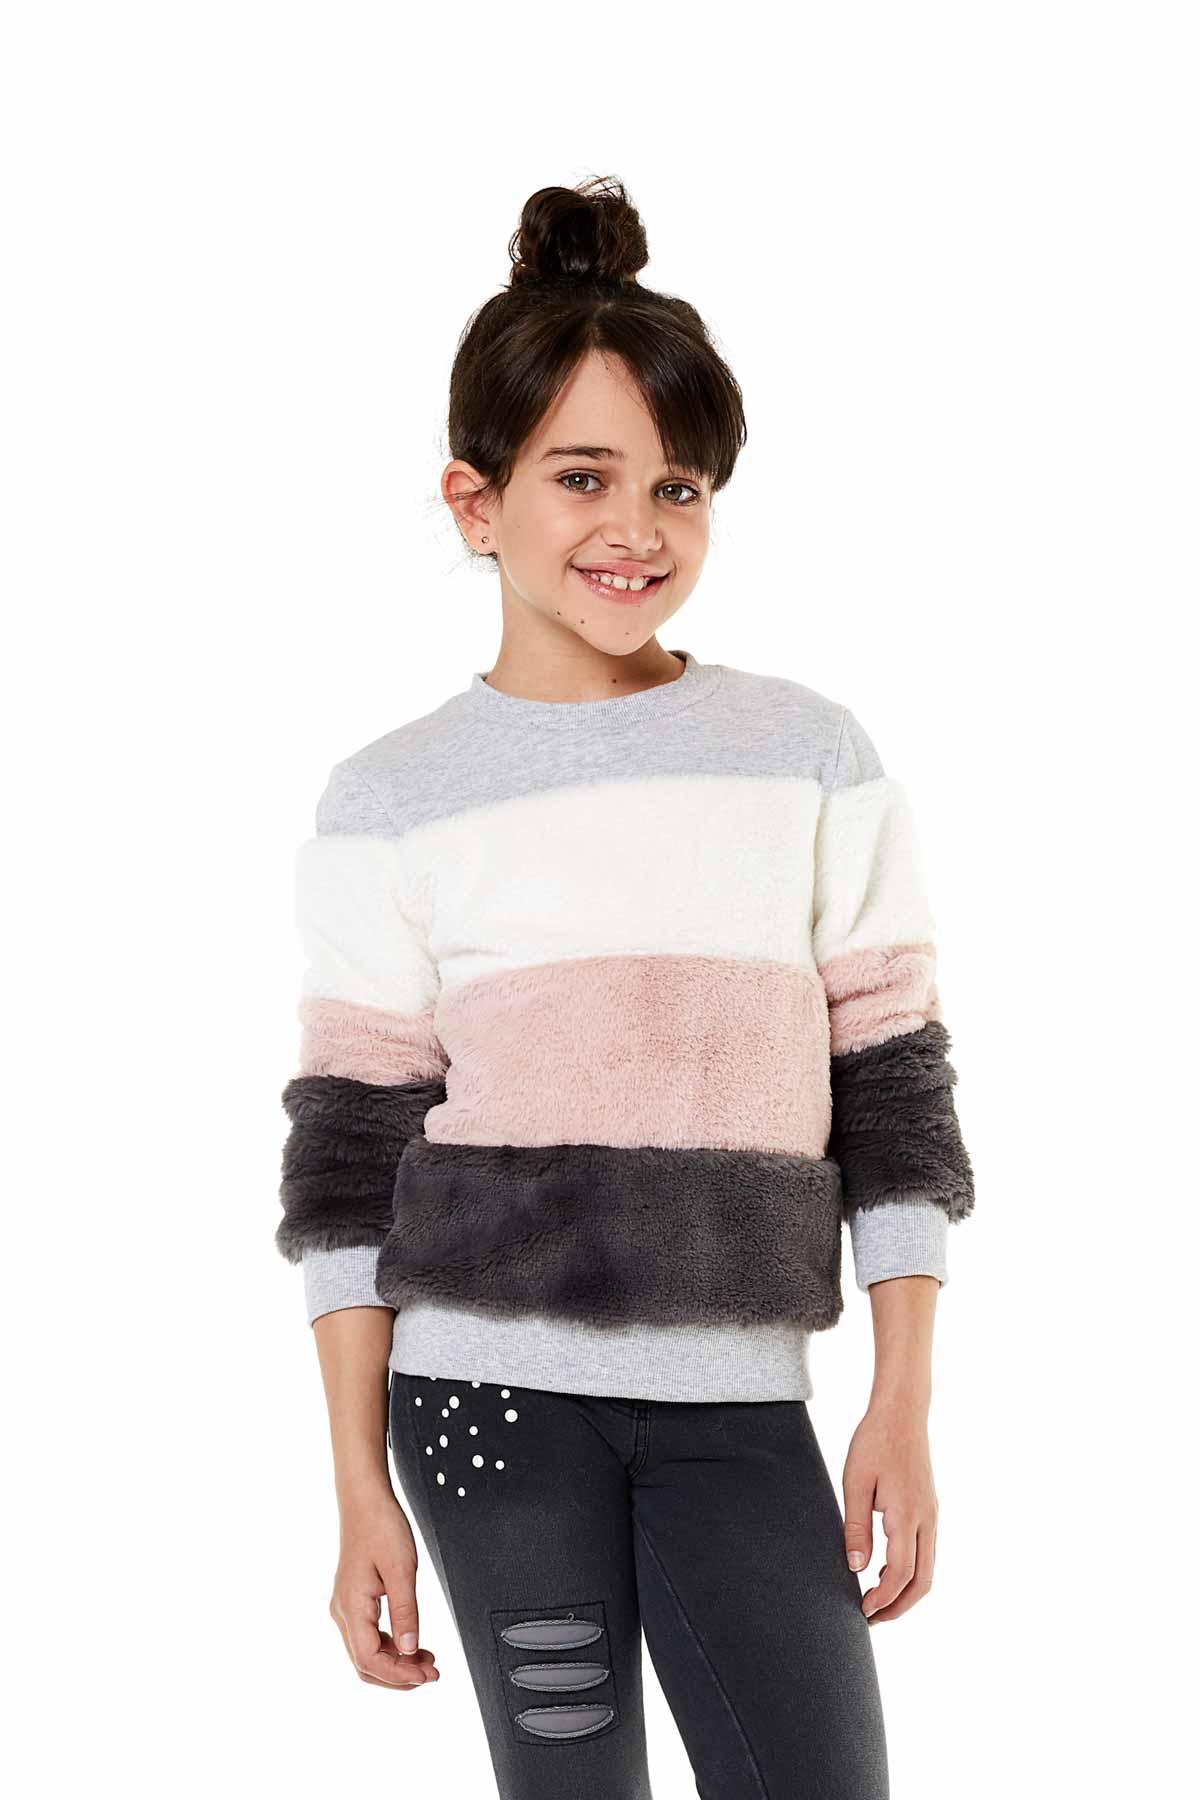 Losan new collection  Lollipop Kids Fashion 9a3f4a3da18